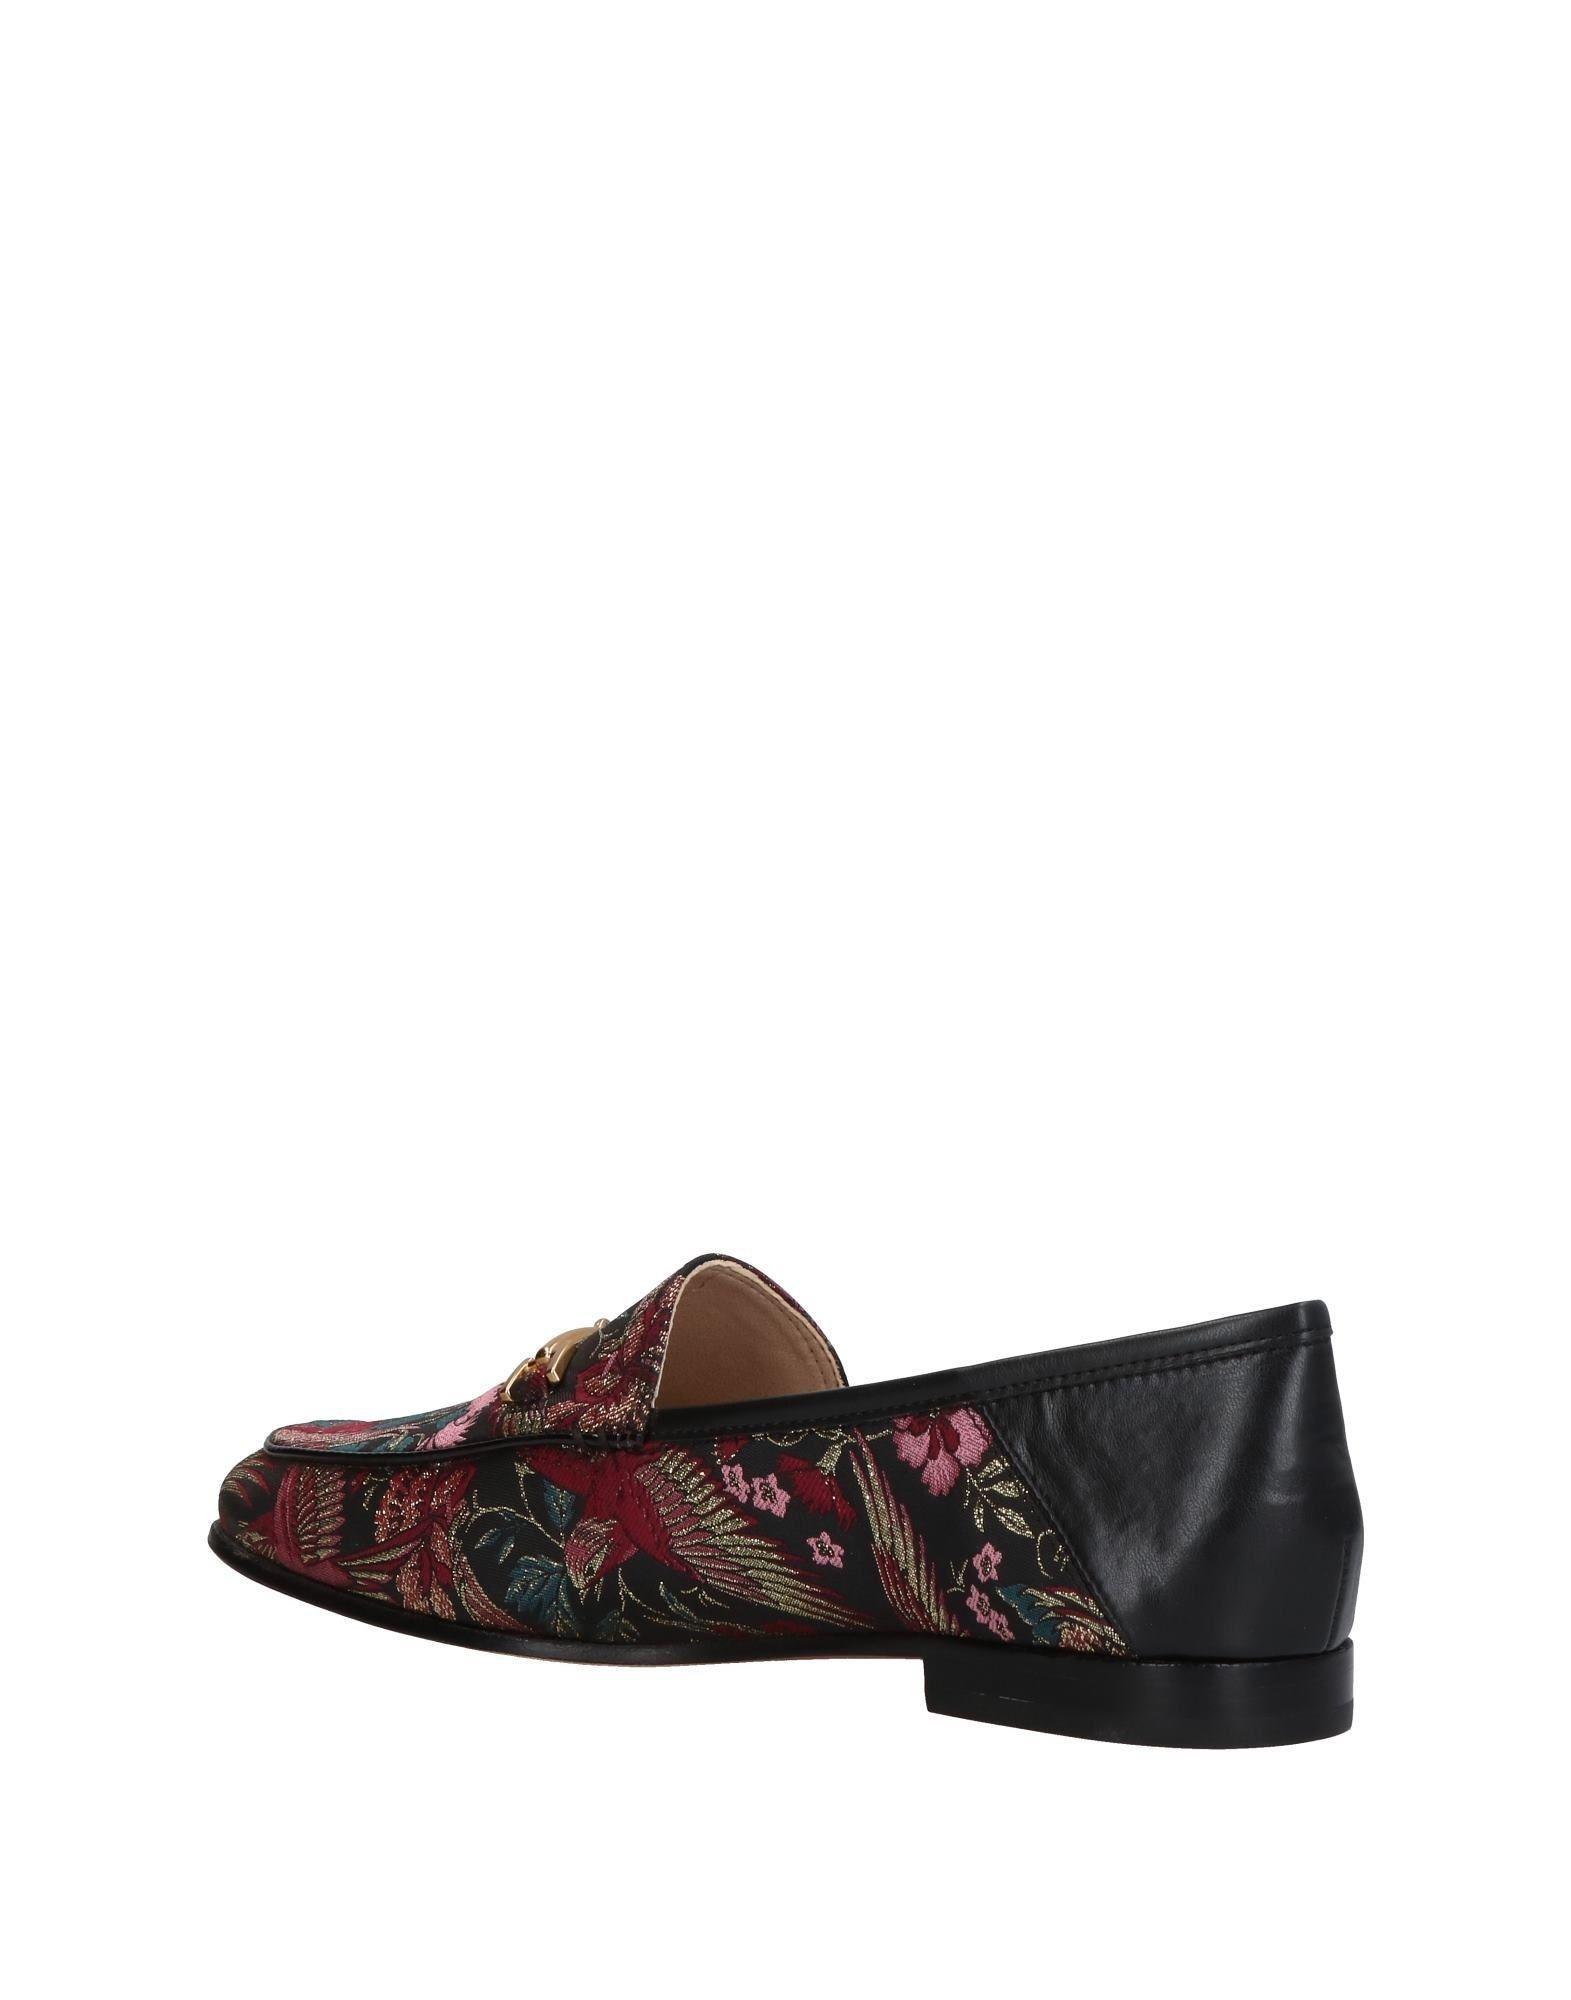 88fb72f06026 Sam Edelman Women's Loraine Loafers in Black - Save 47% - Lyst